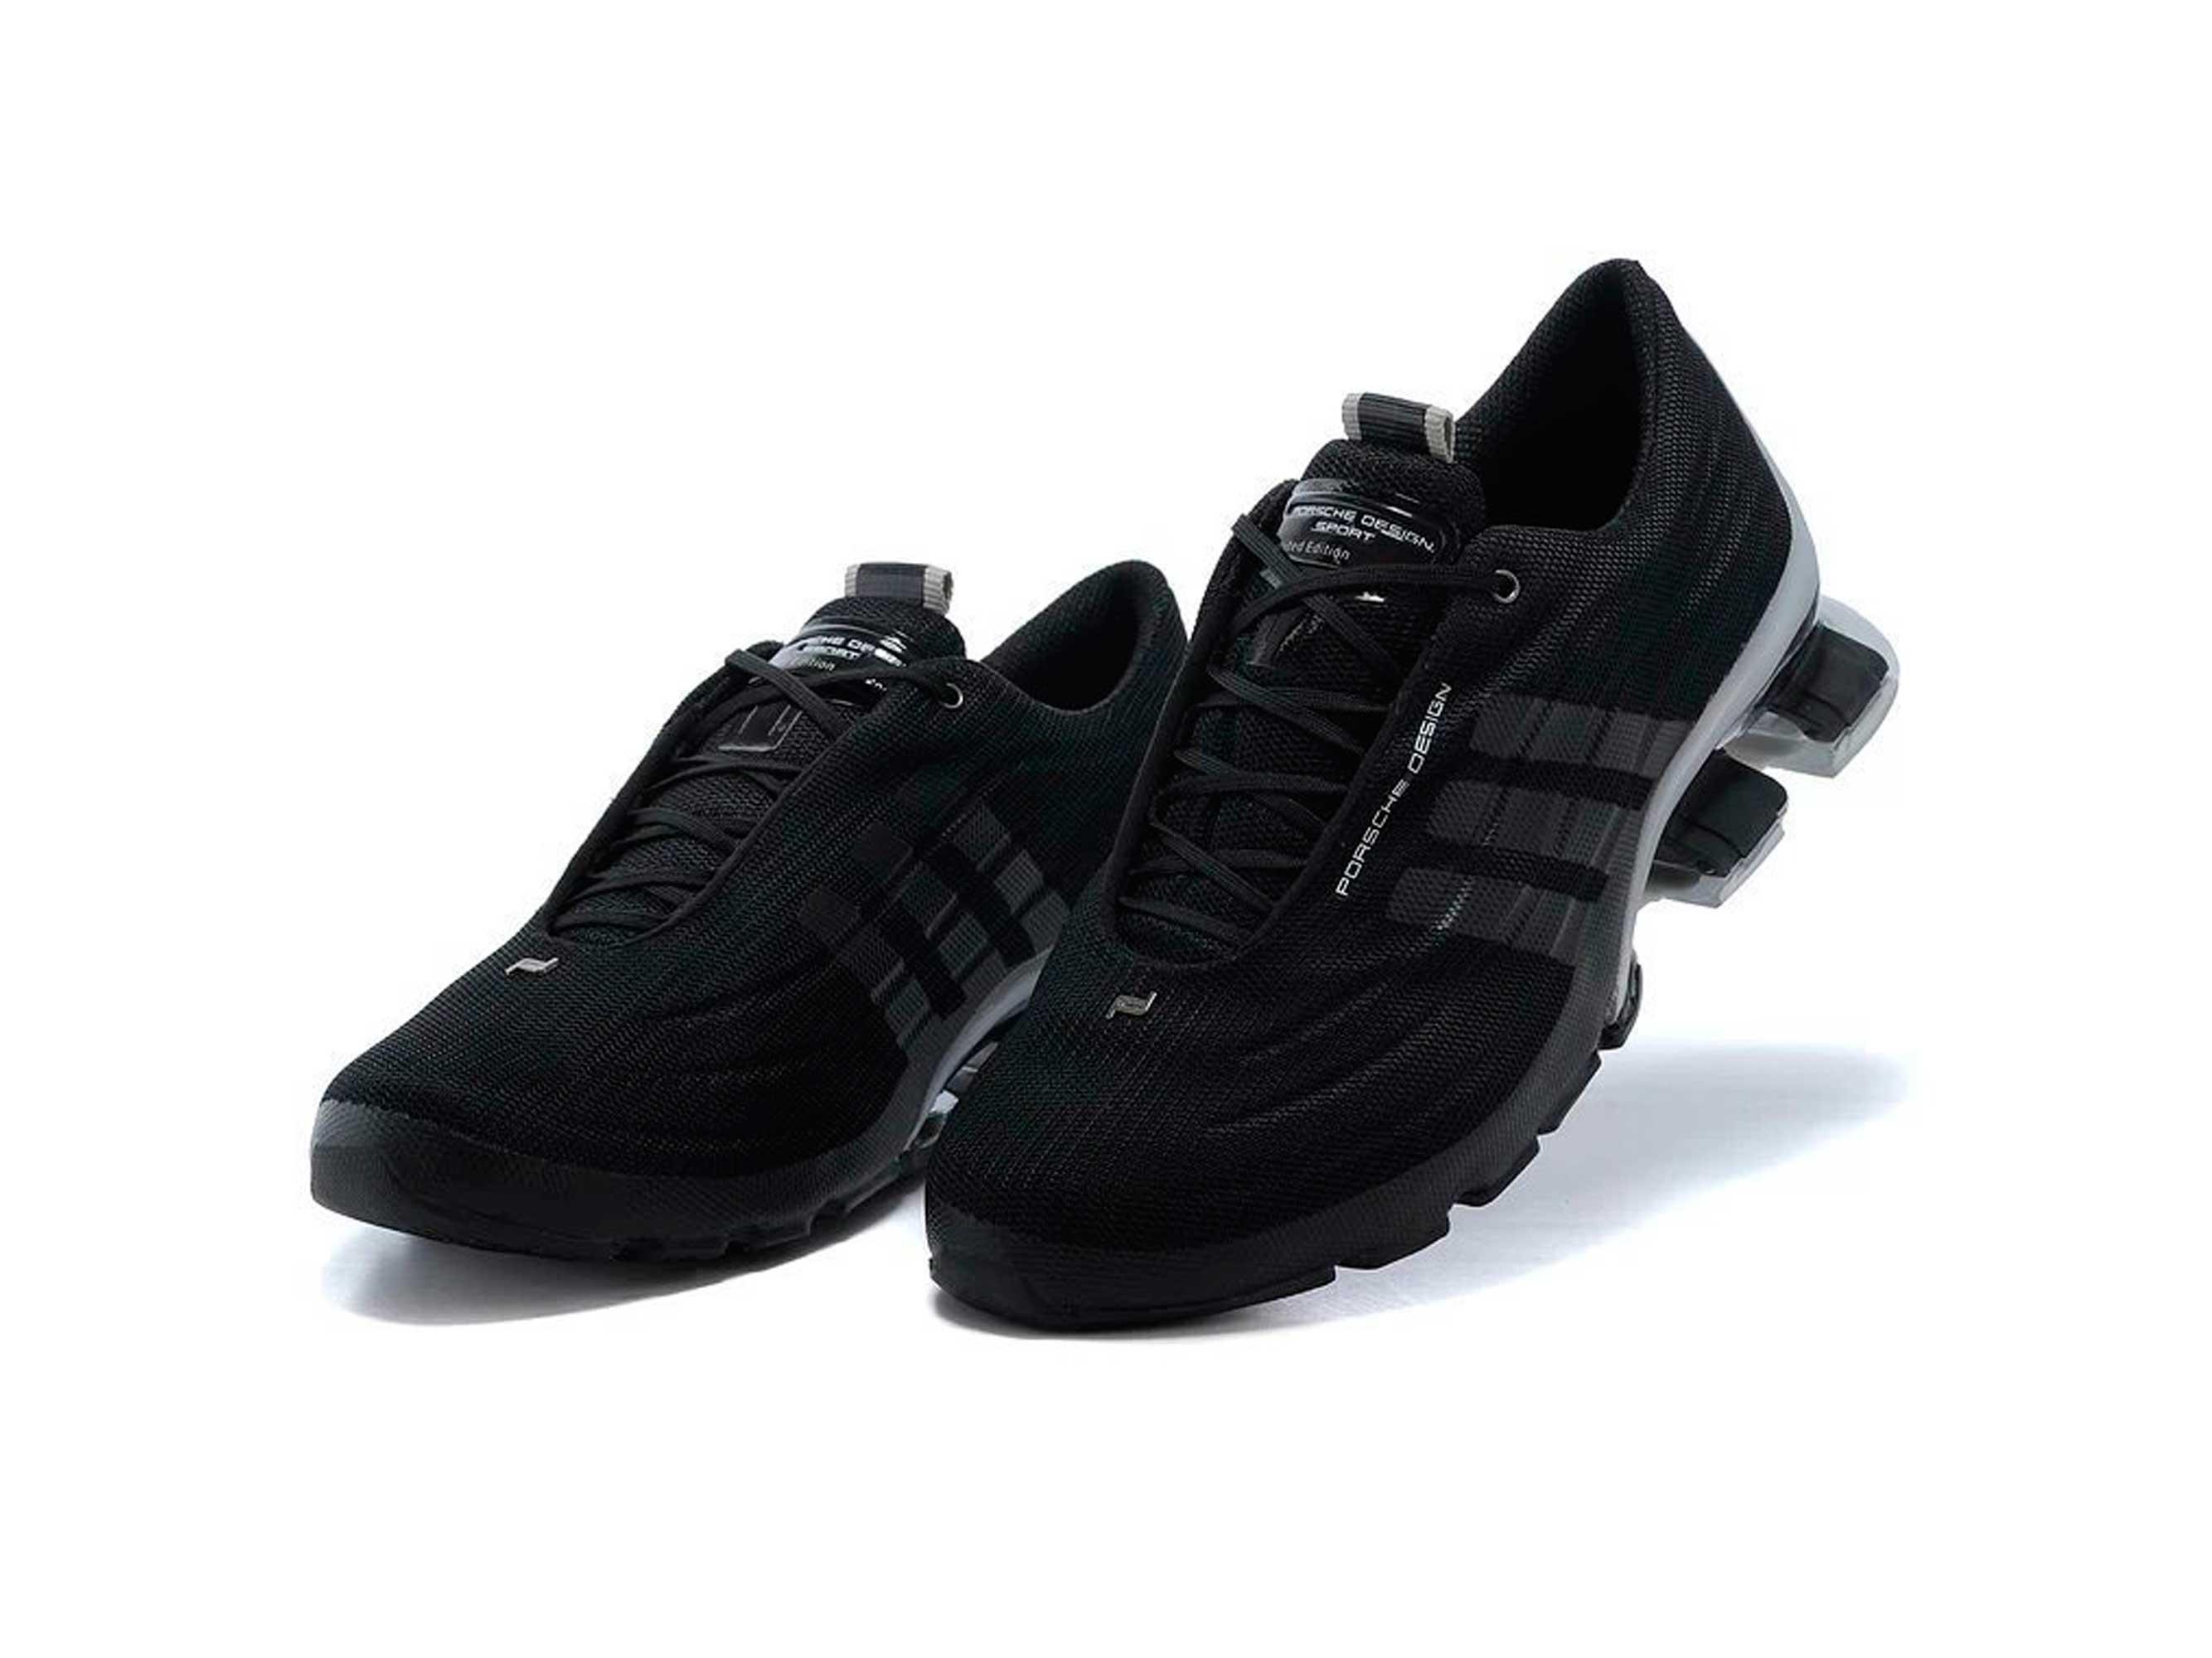 best sneakers 4c06e 9425d release date adidas porsche design bounce s4 flyknit dark ...